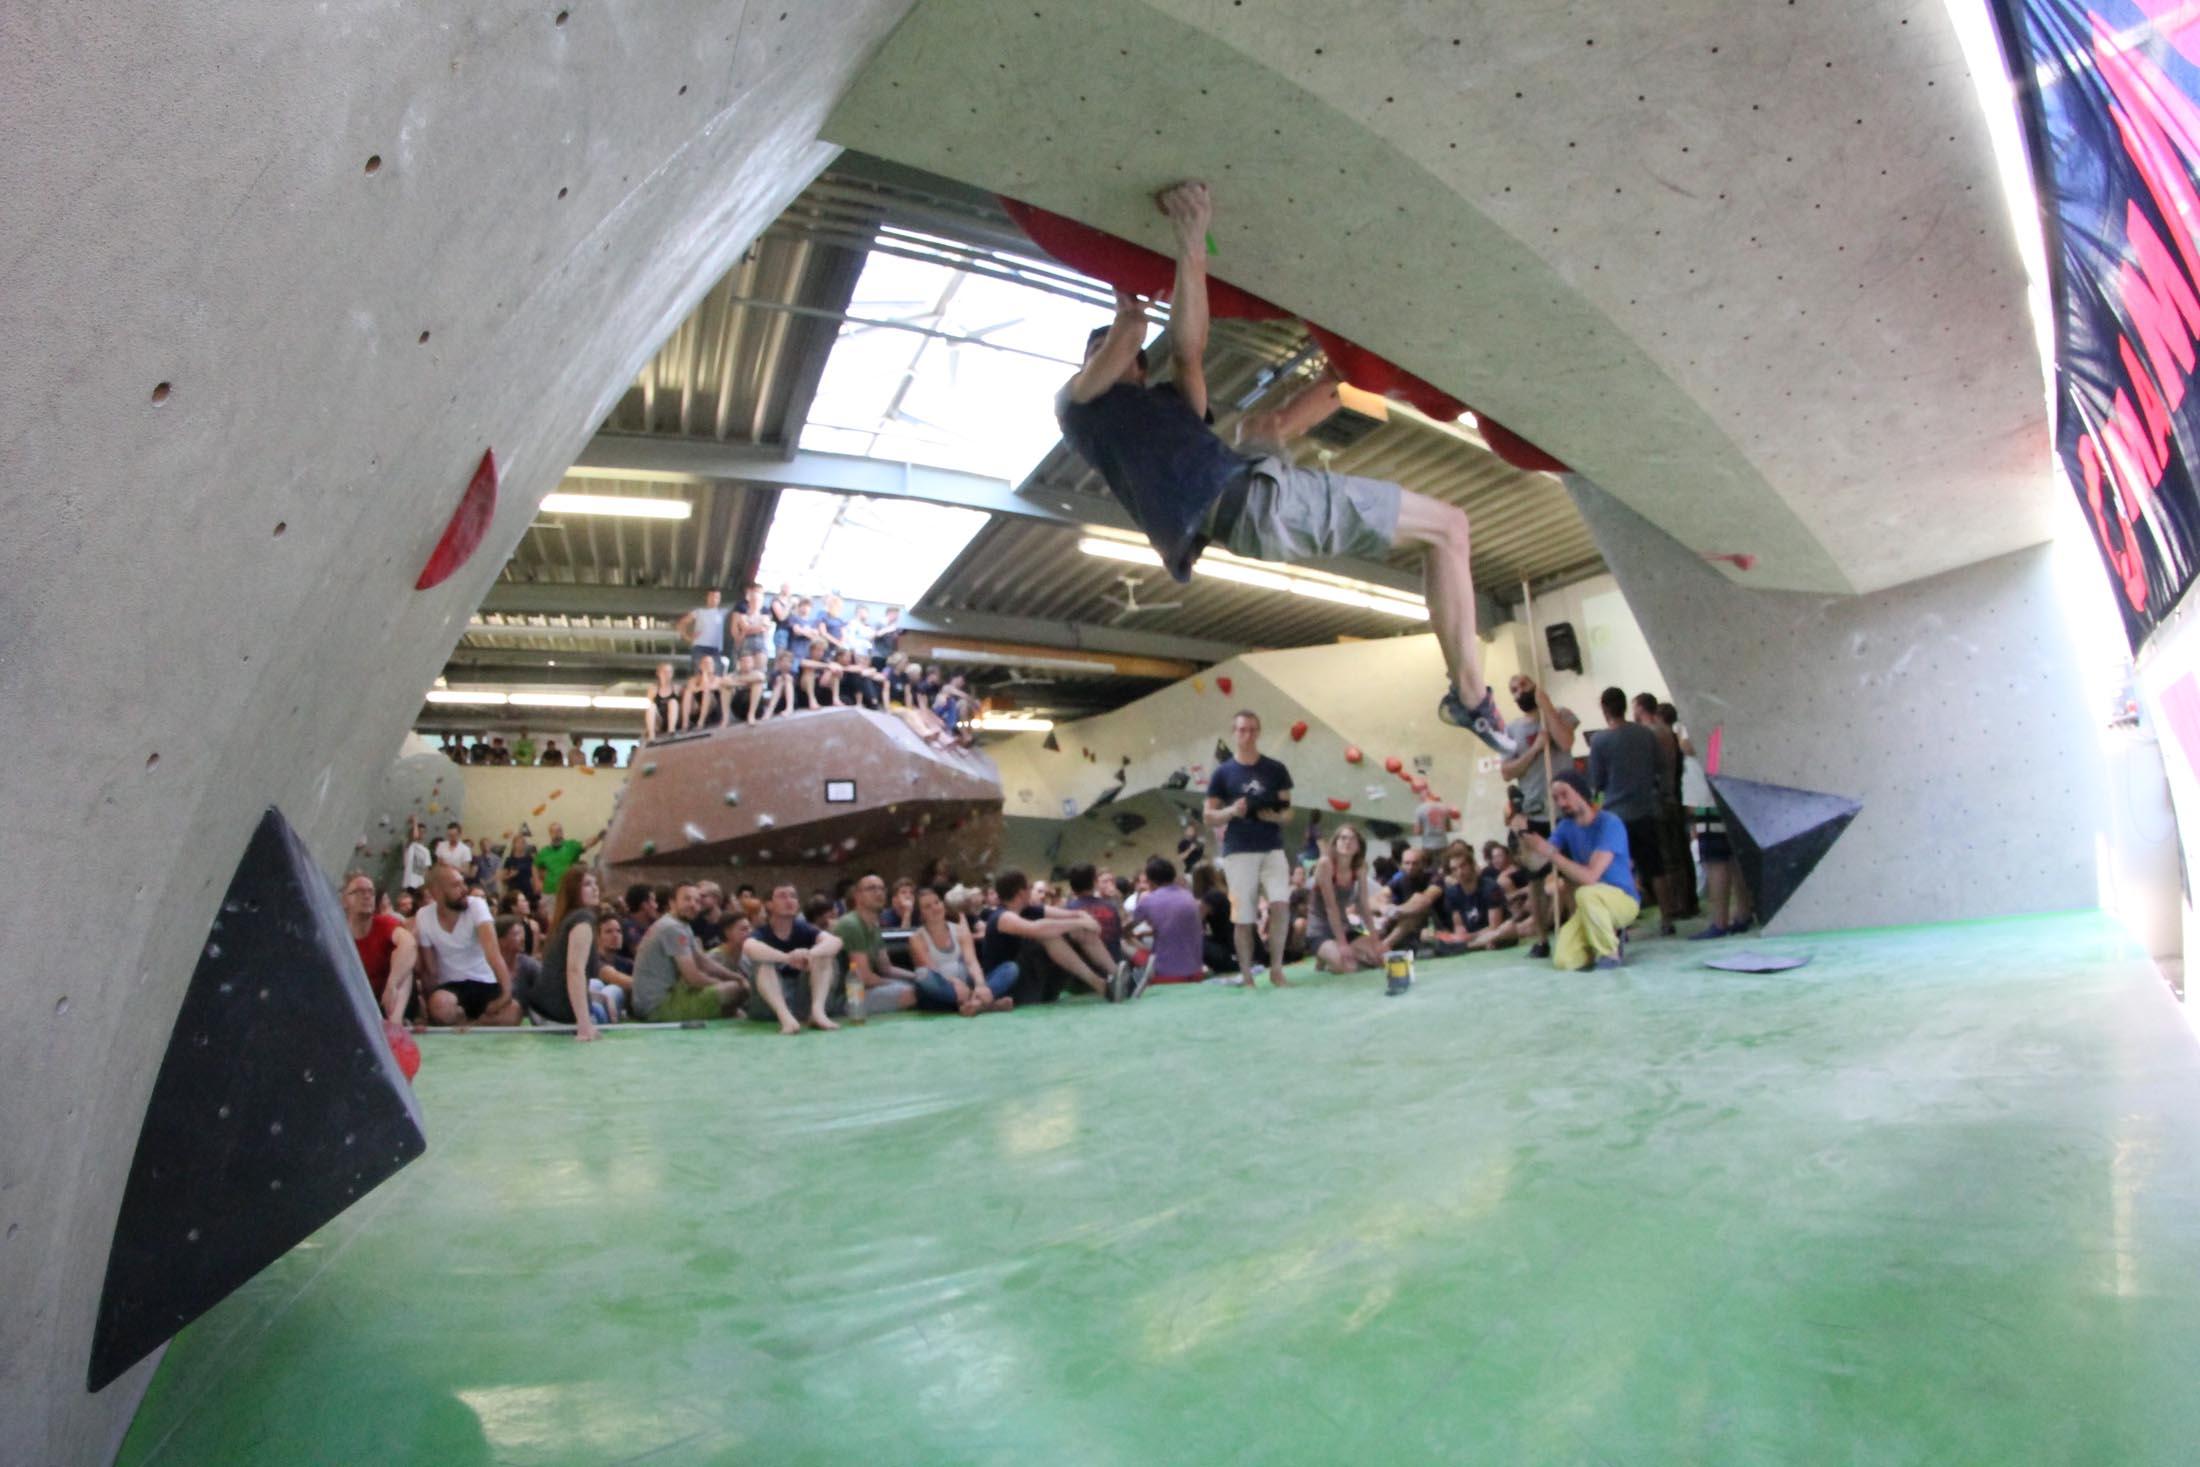 Finale, internationaler bouldercup Frankenjura 2016, BLOCKHELDEN Erlangen, Mammut, Bergfreunde.de, Boulderwettkampf07092016622